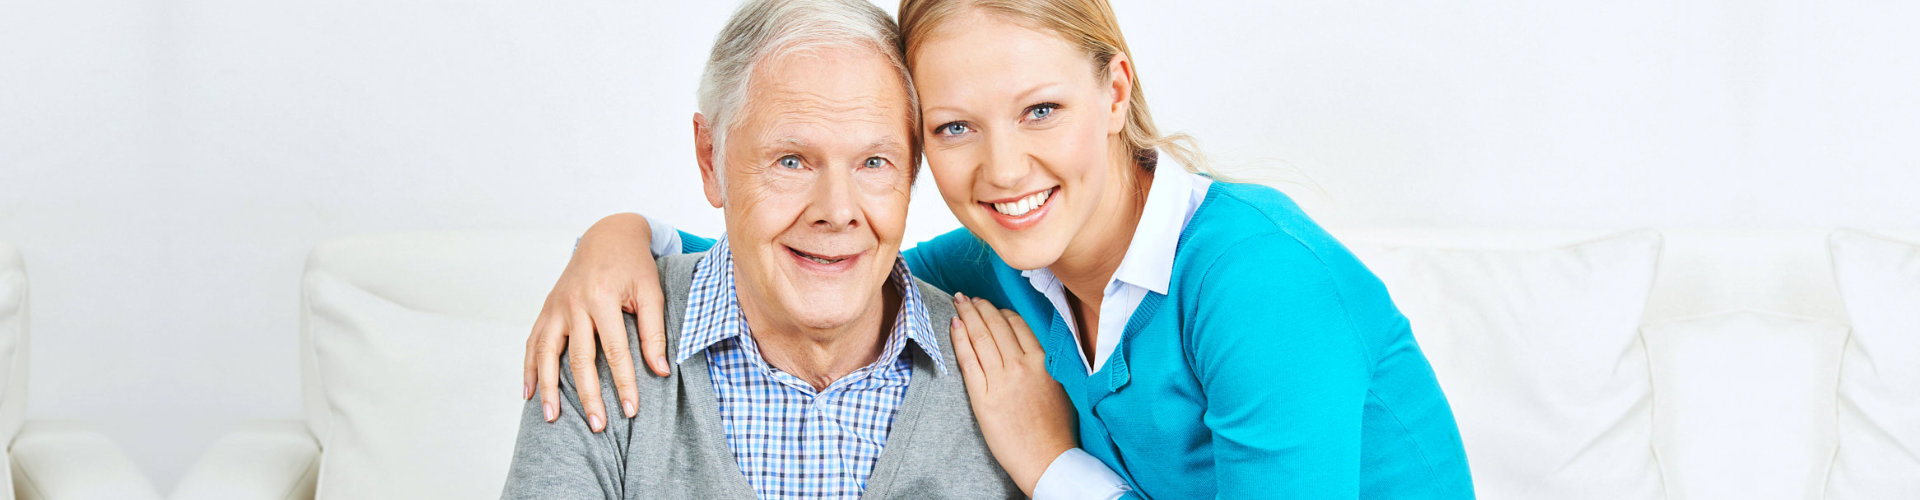 caregiver hugging her senior patient